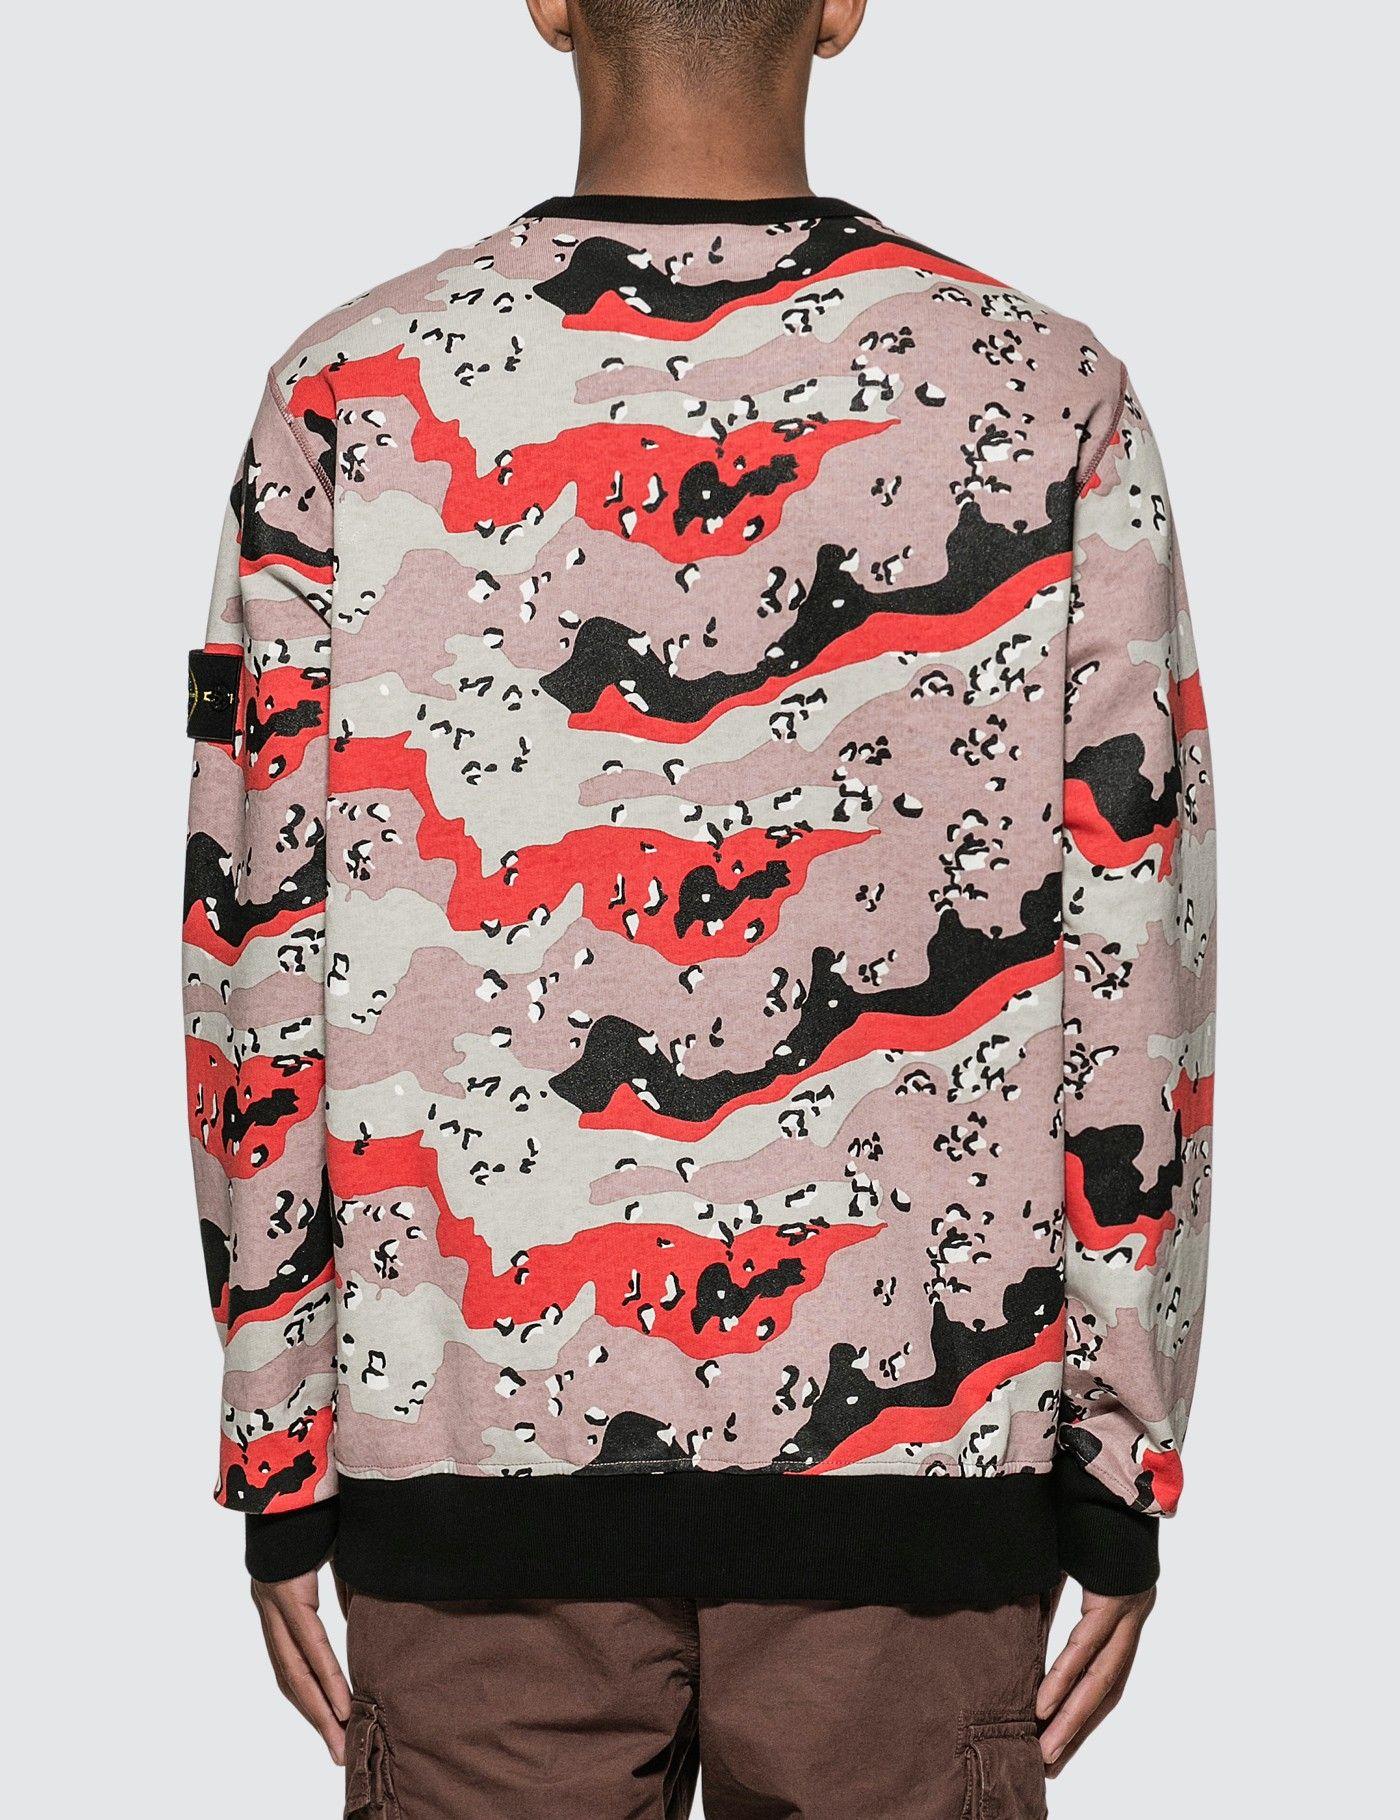 Stone Island Desert Camo Sweatshirt Hbx Sweatshirts Camo Sweatshirt Shopping Outfit [ 1820 x 1400 Pixel ]